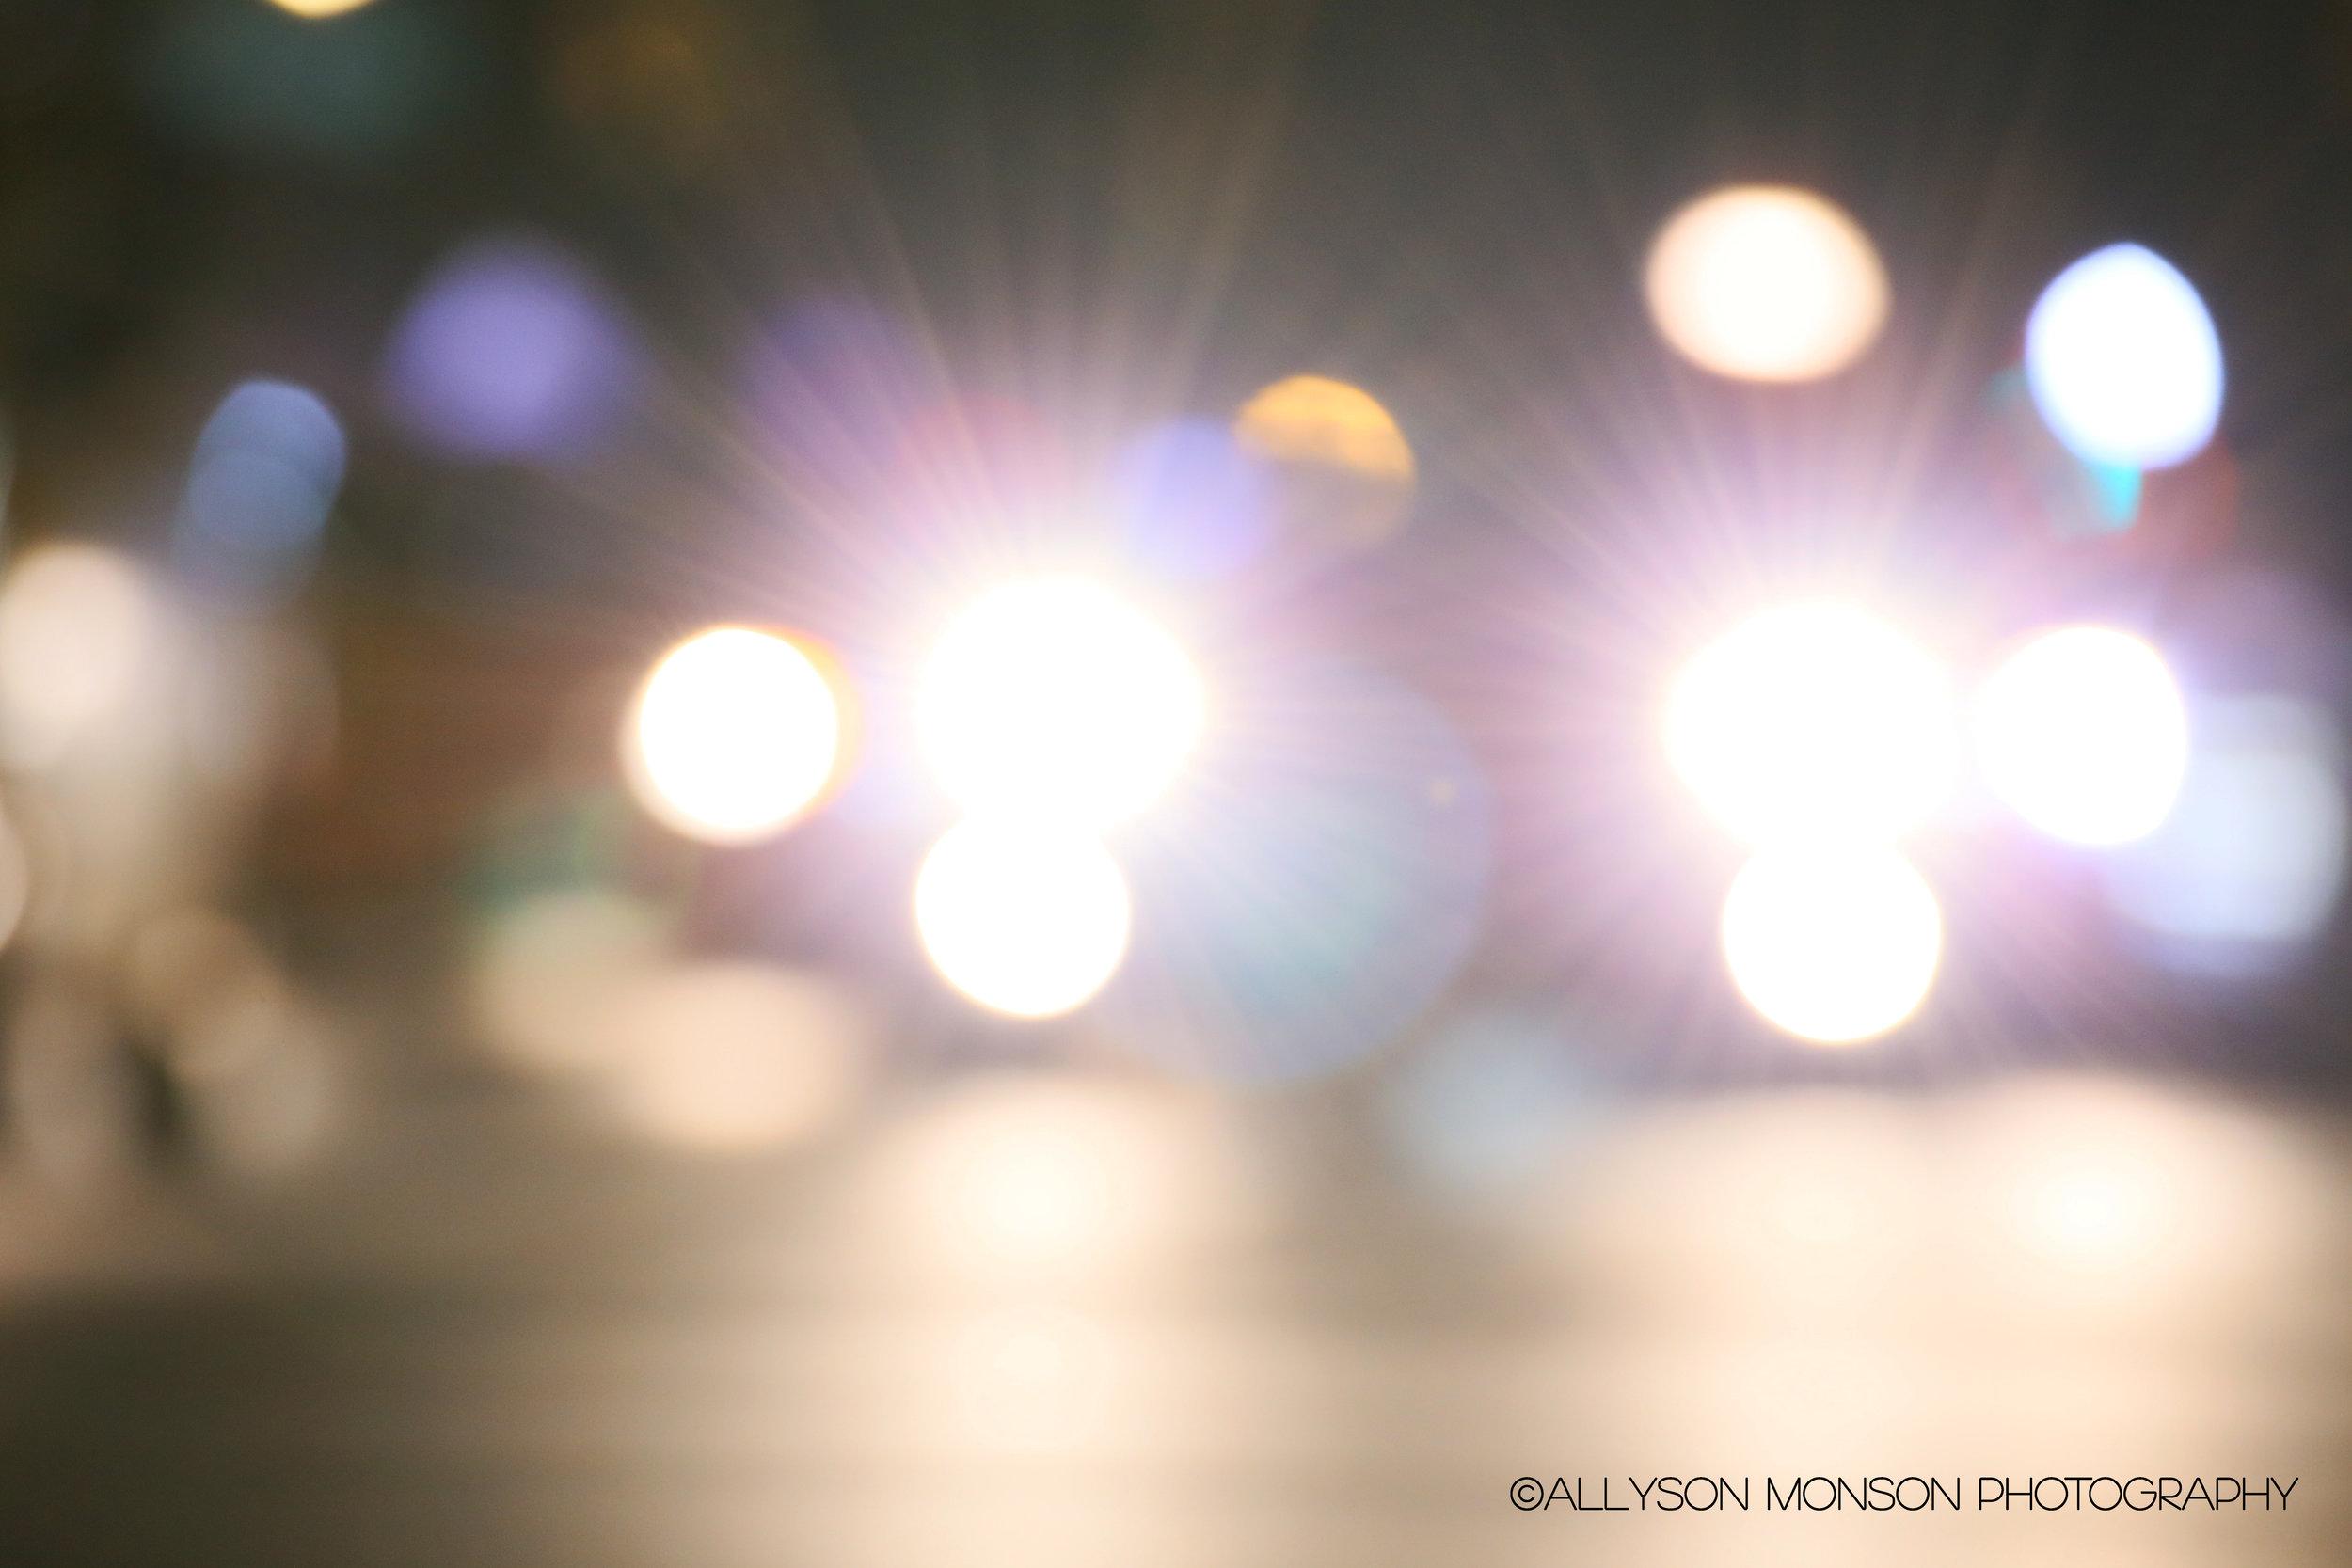 ON 57,  Allsyon Monson Photography